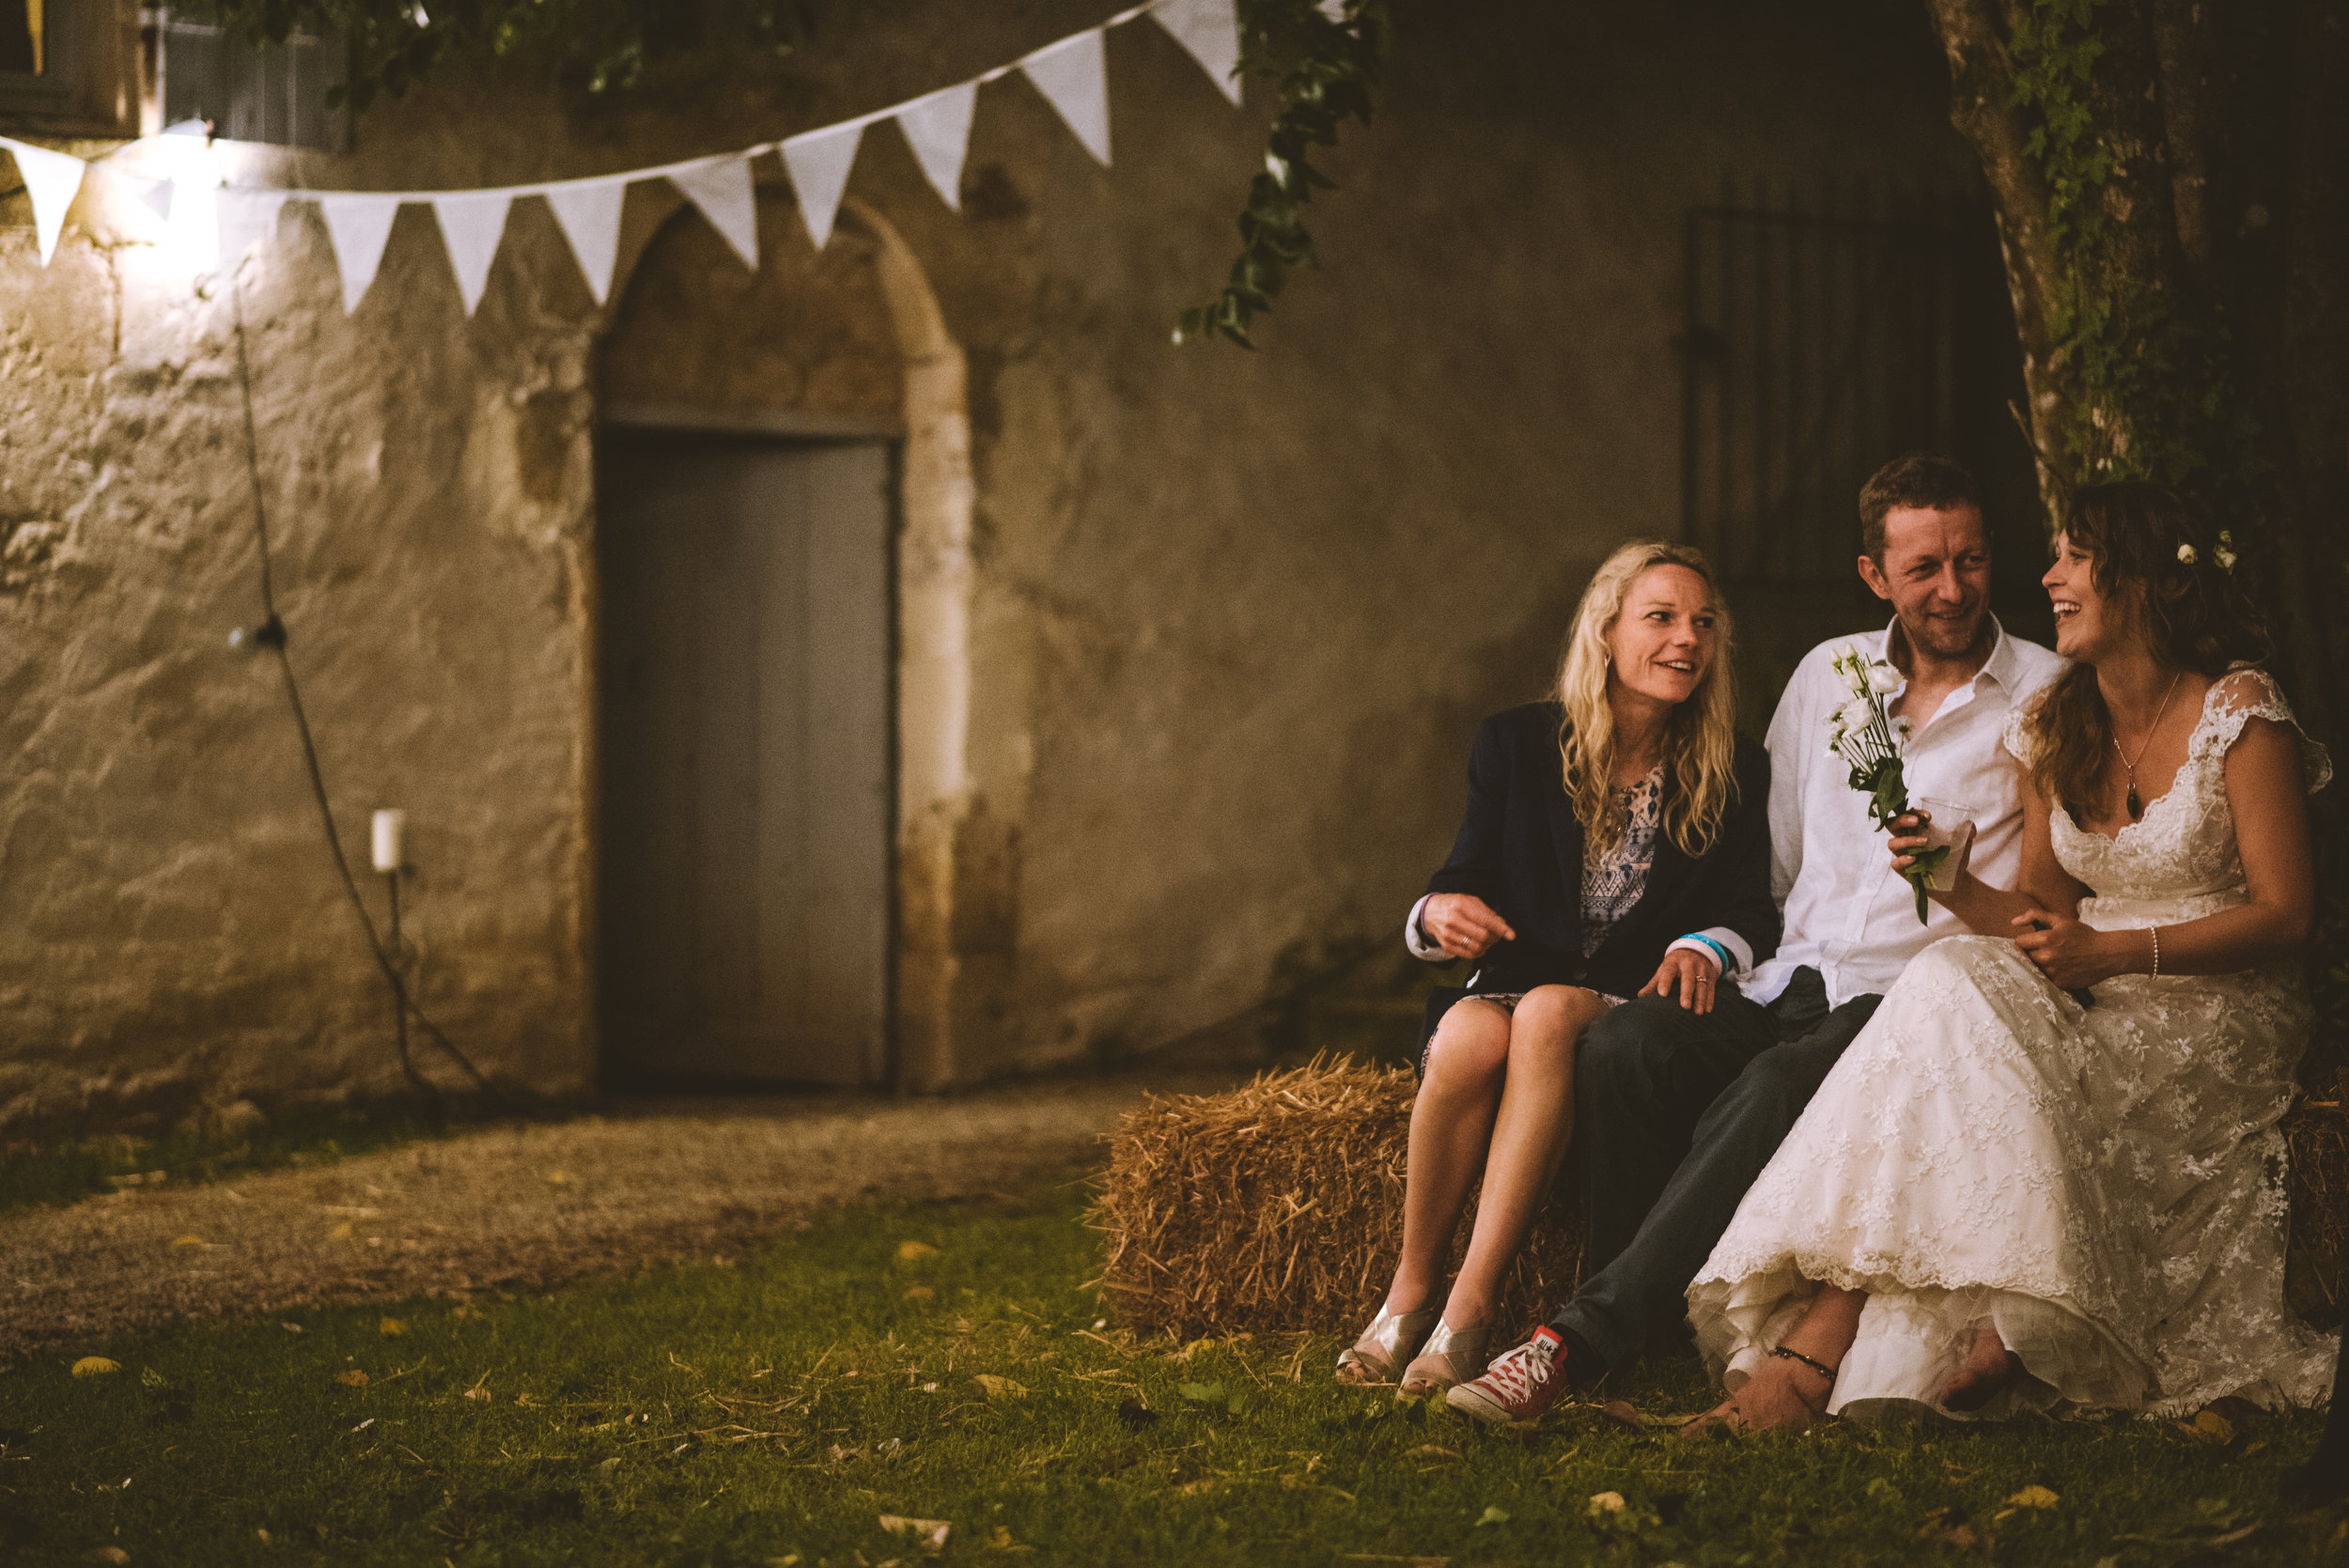 wedding-photographer-dordogne-mark-shaw-82.jpg